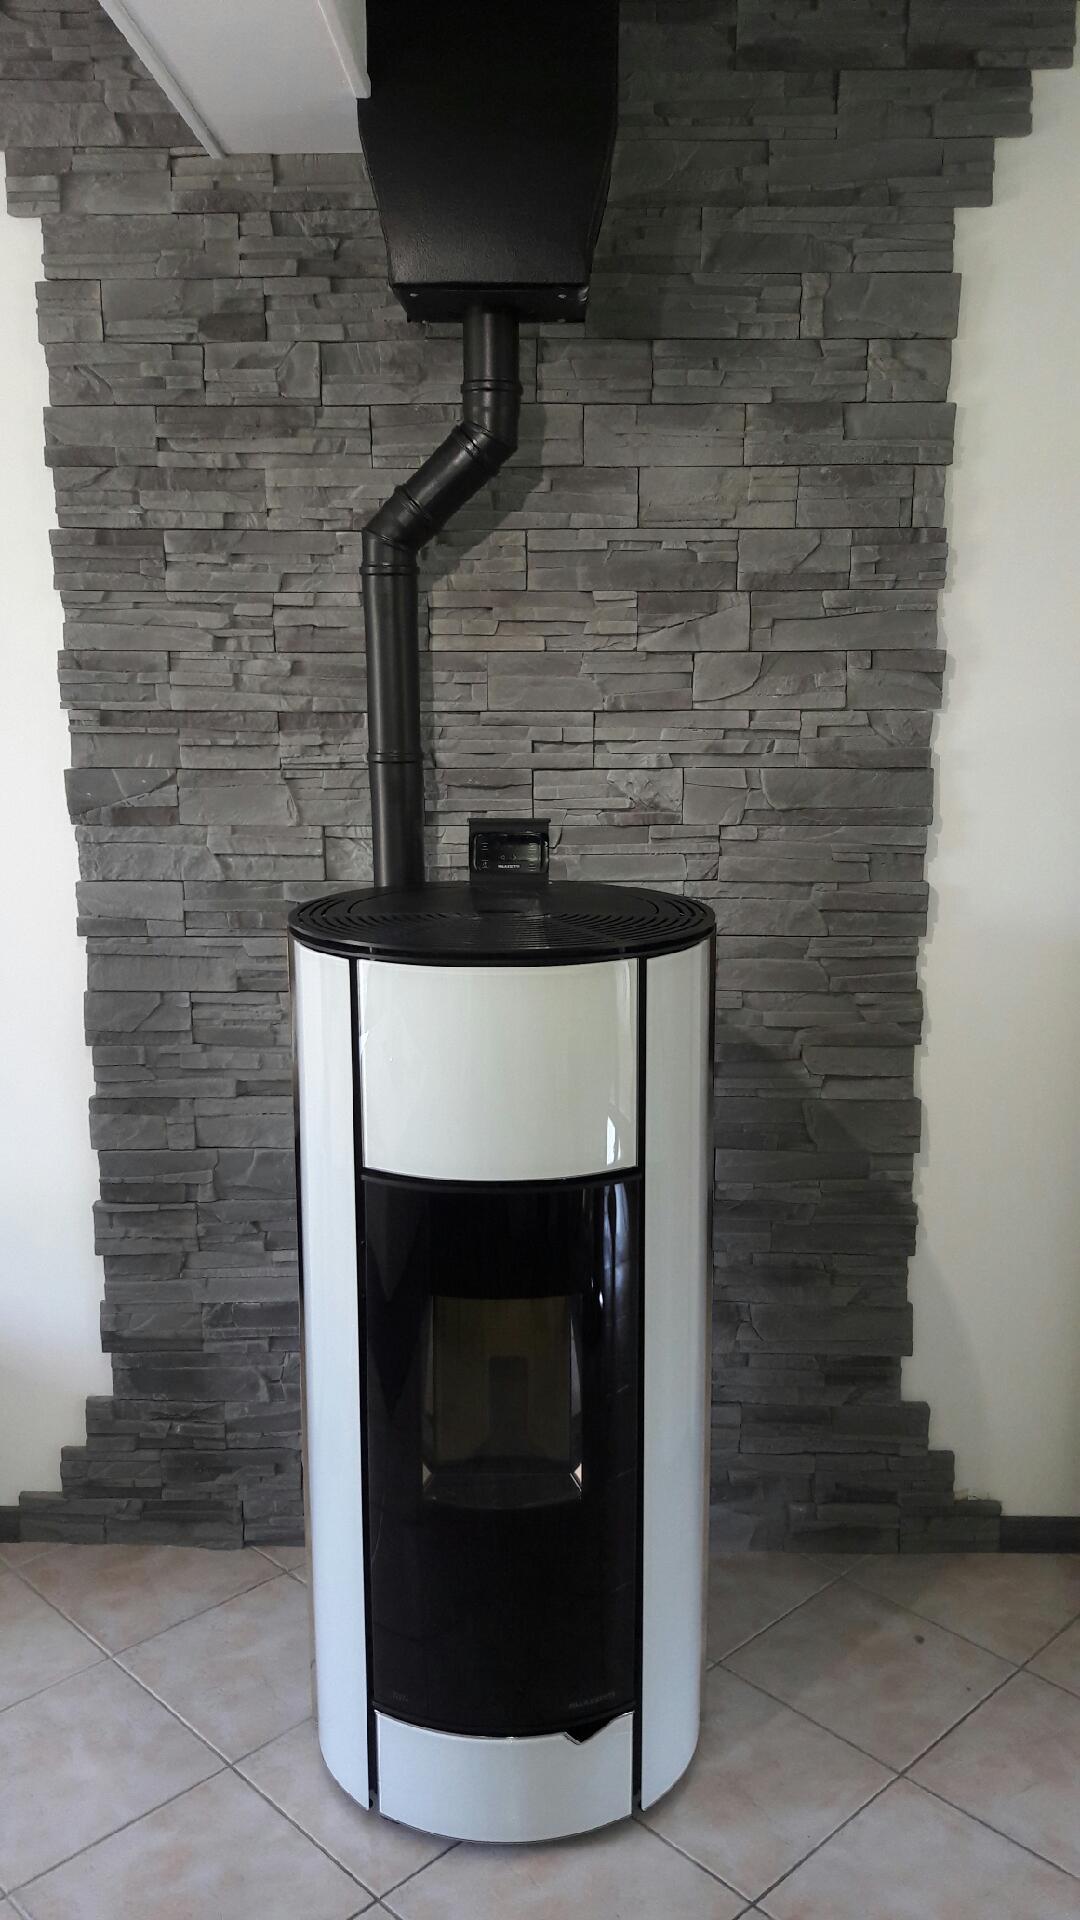 installer un poele a granule id es d coration id es. Black Bedroom Furniture Sets. Home Design Ideas